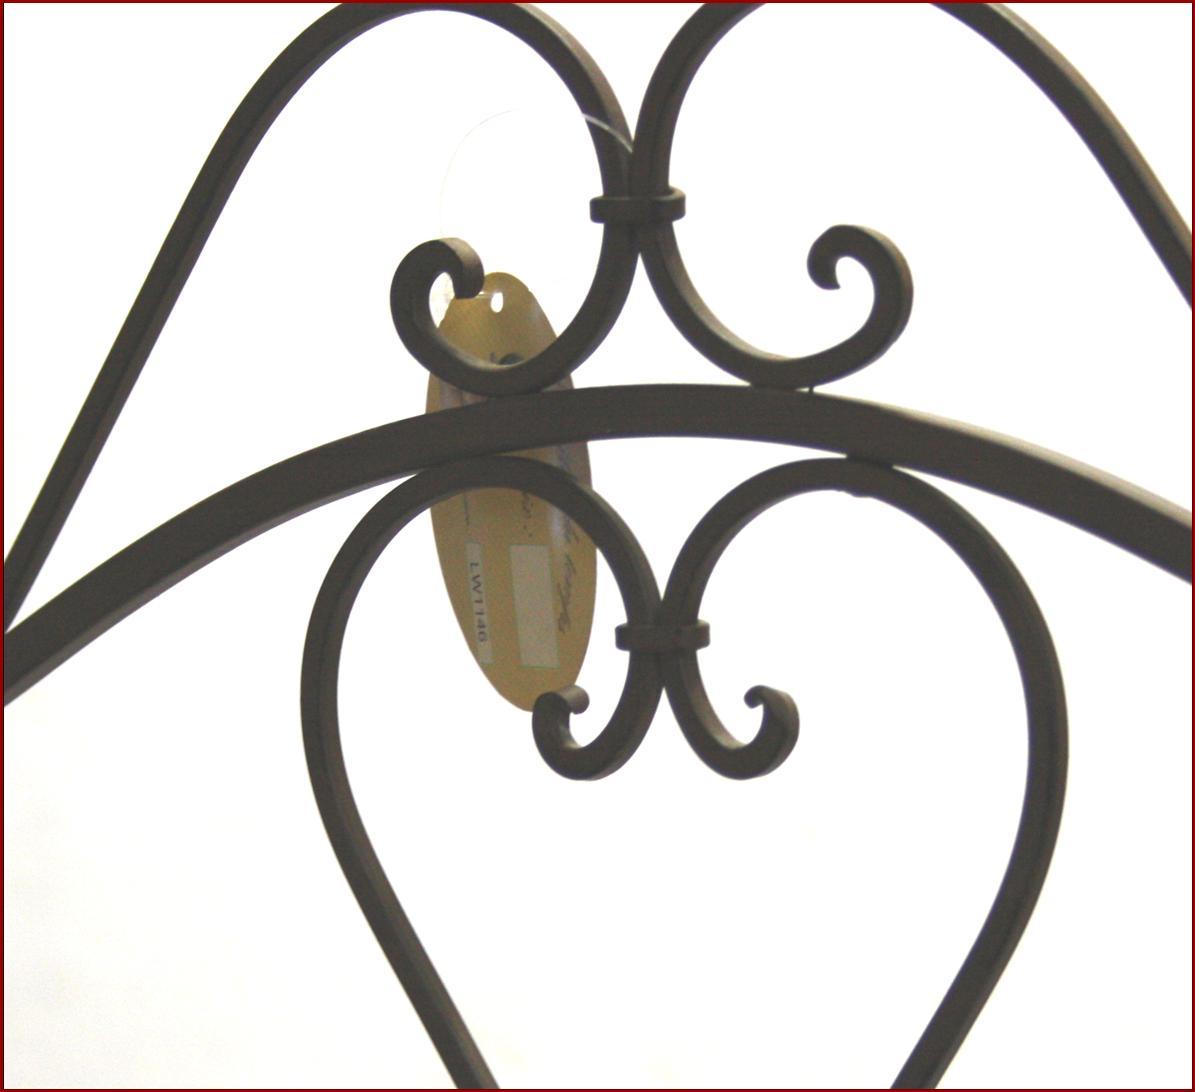 Boulangere etagere en fer forge style ancienne ebay - Etagere murale fer forge ...